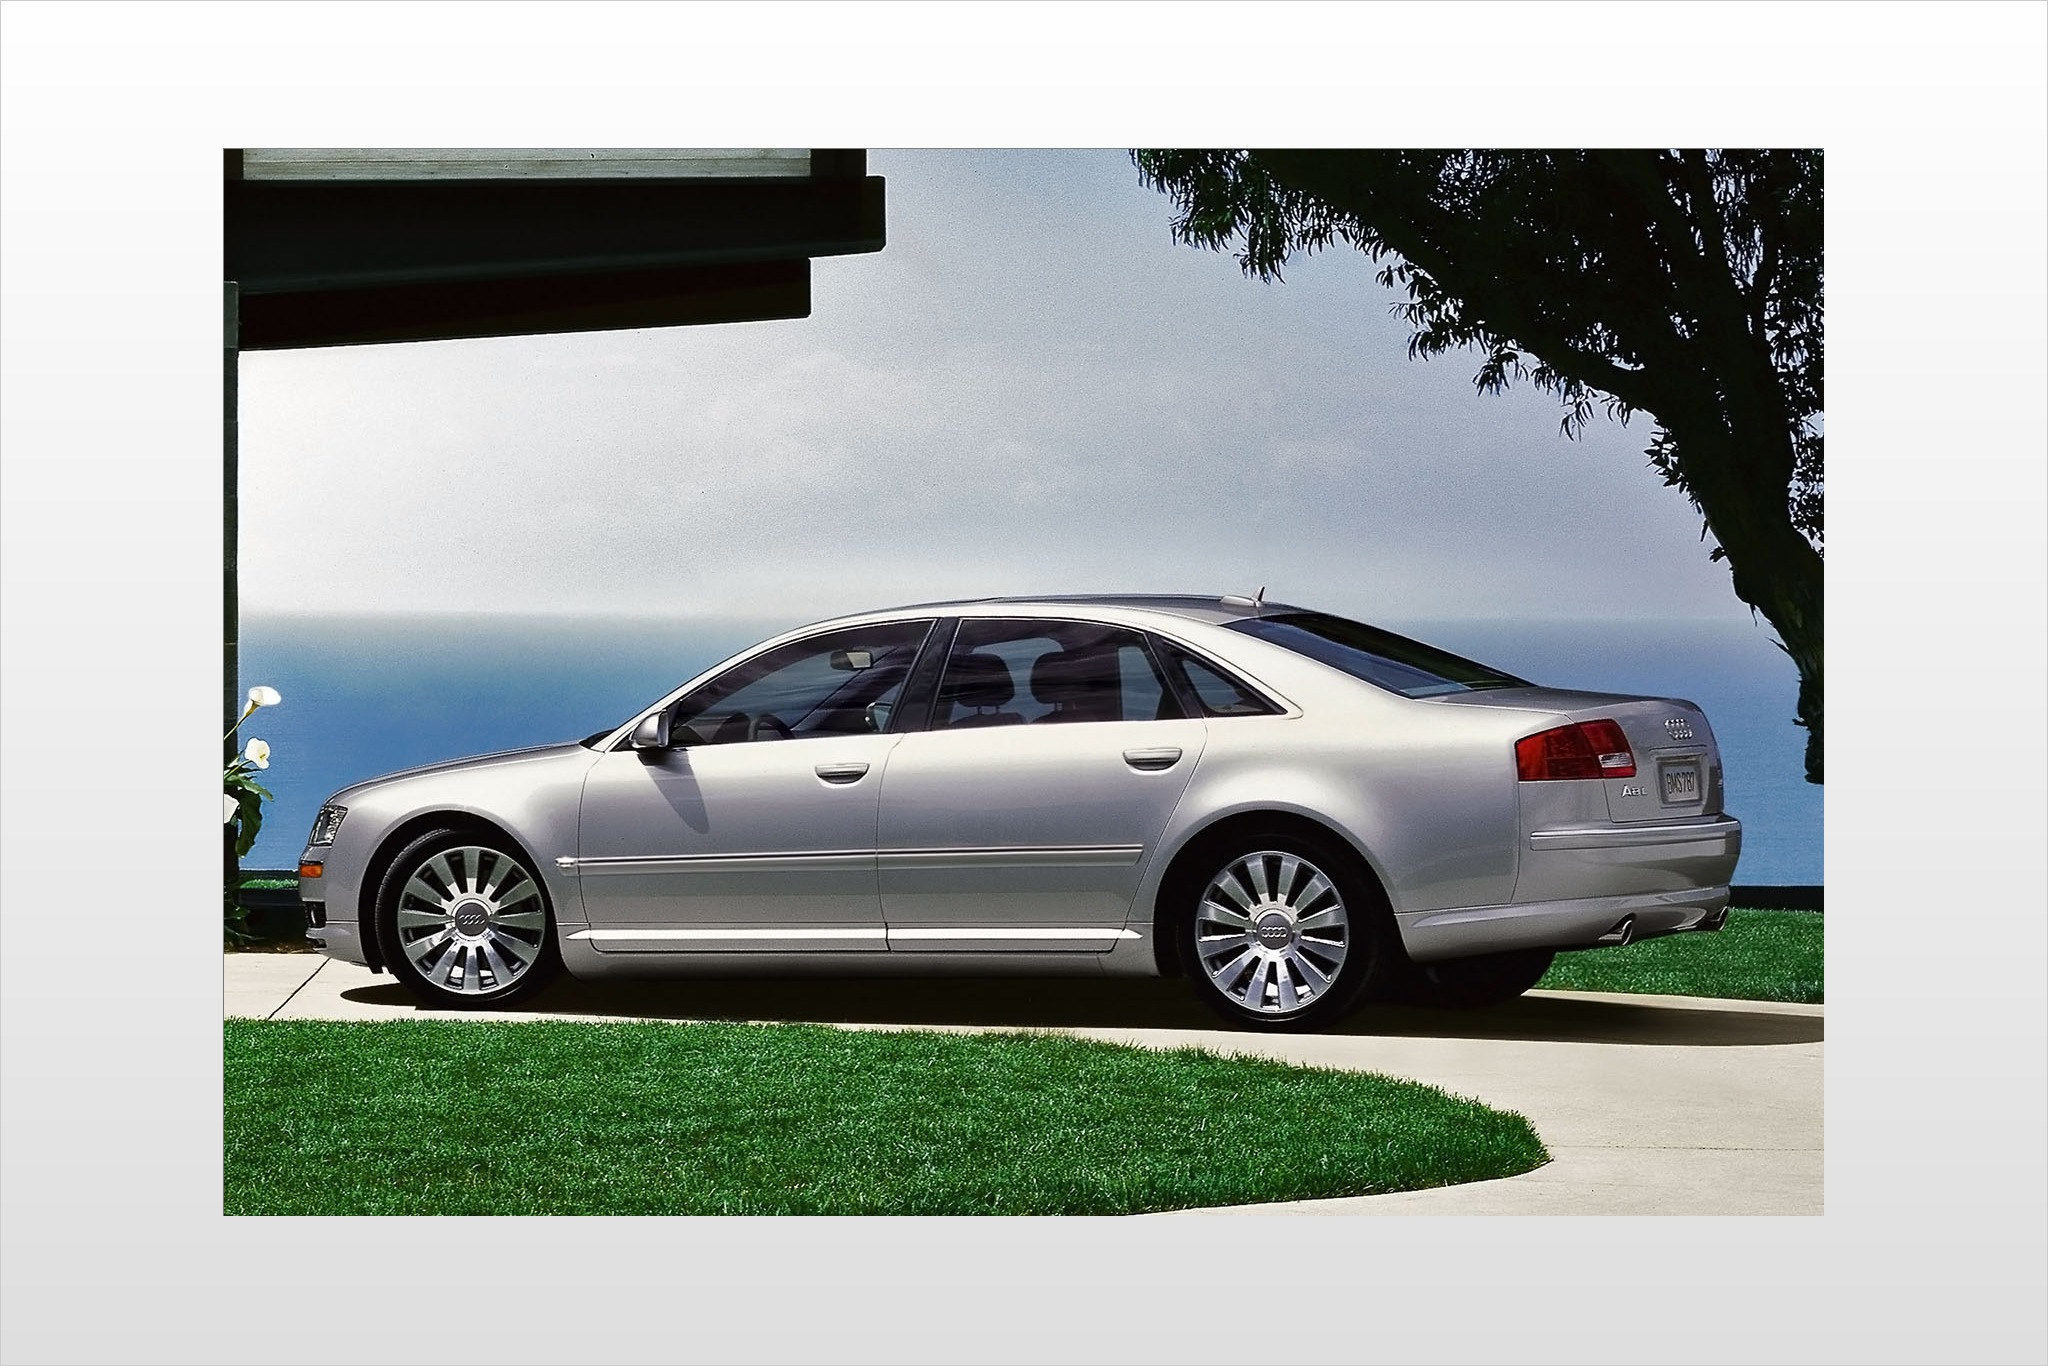 2007 Audi A8 Image 8